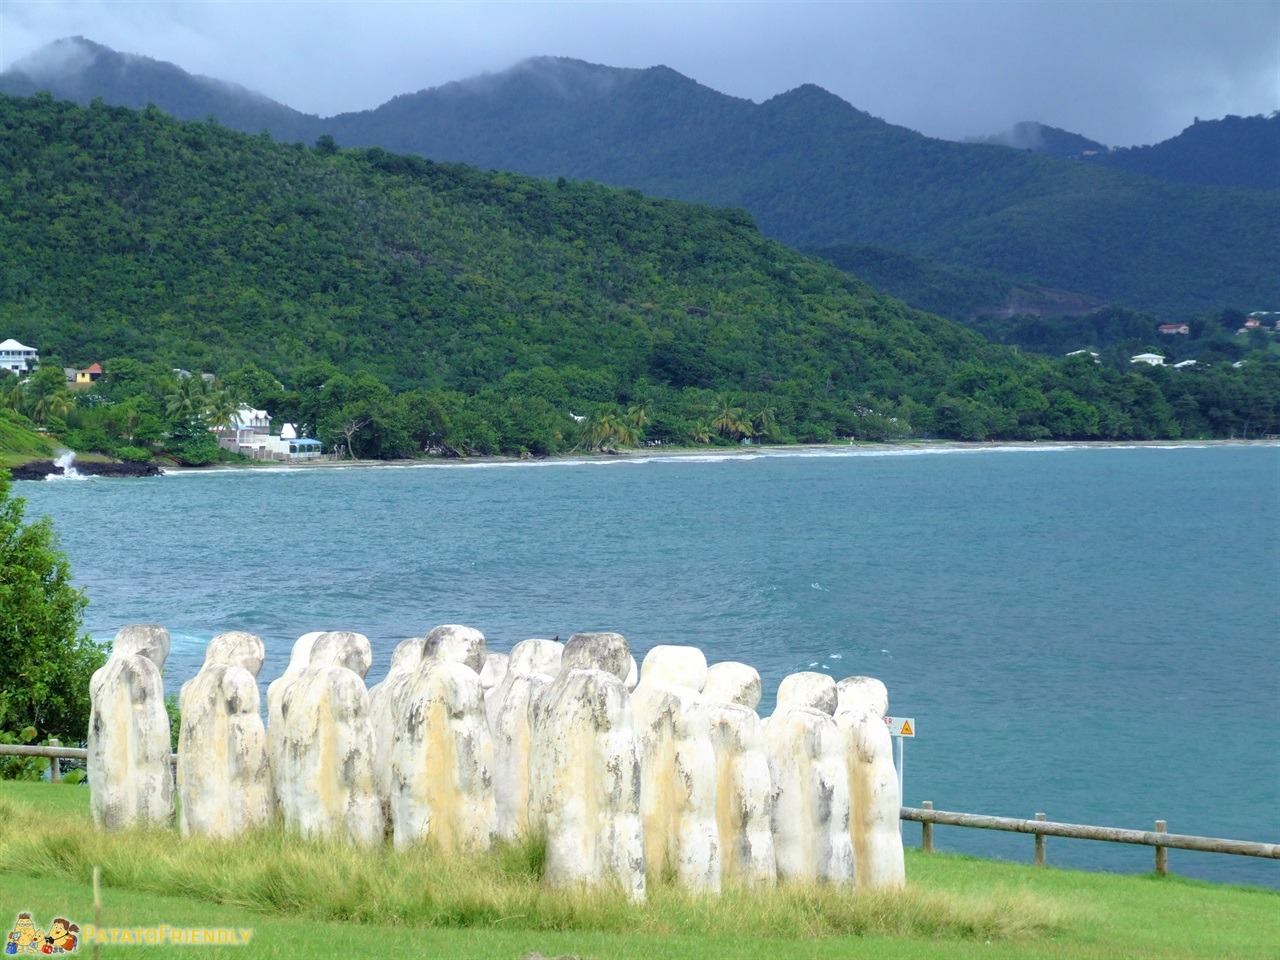 Le spiagge della Martinica - Les Anses d'Arlet